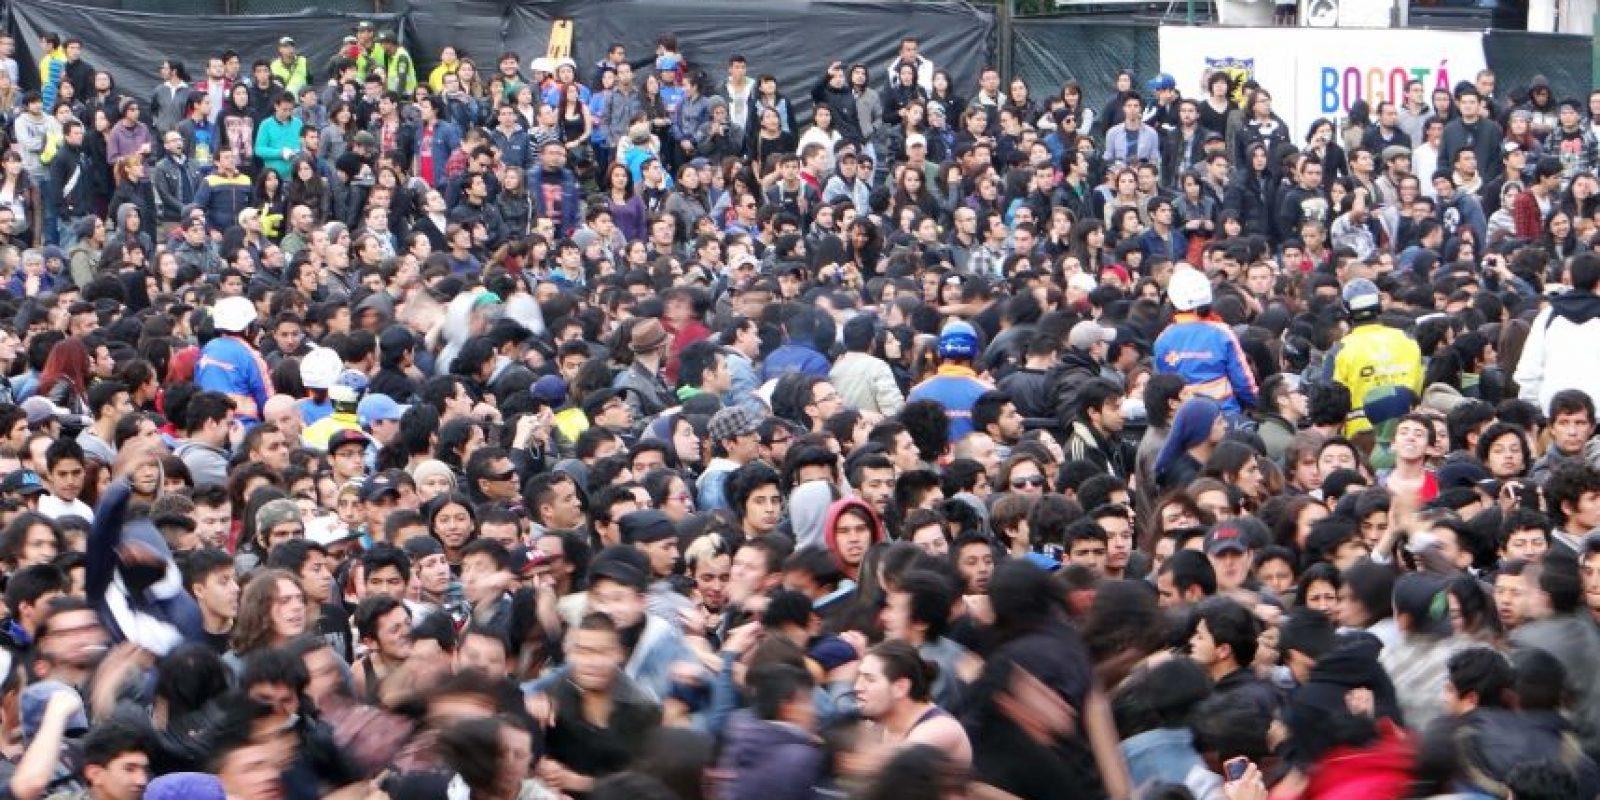 Foto: Diego Hernán Pérez Serrano/PUBLIMETRO